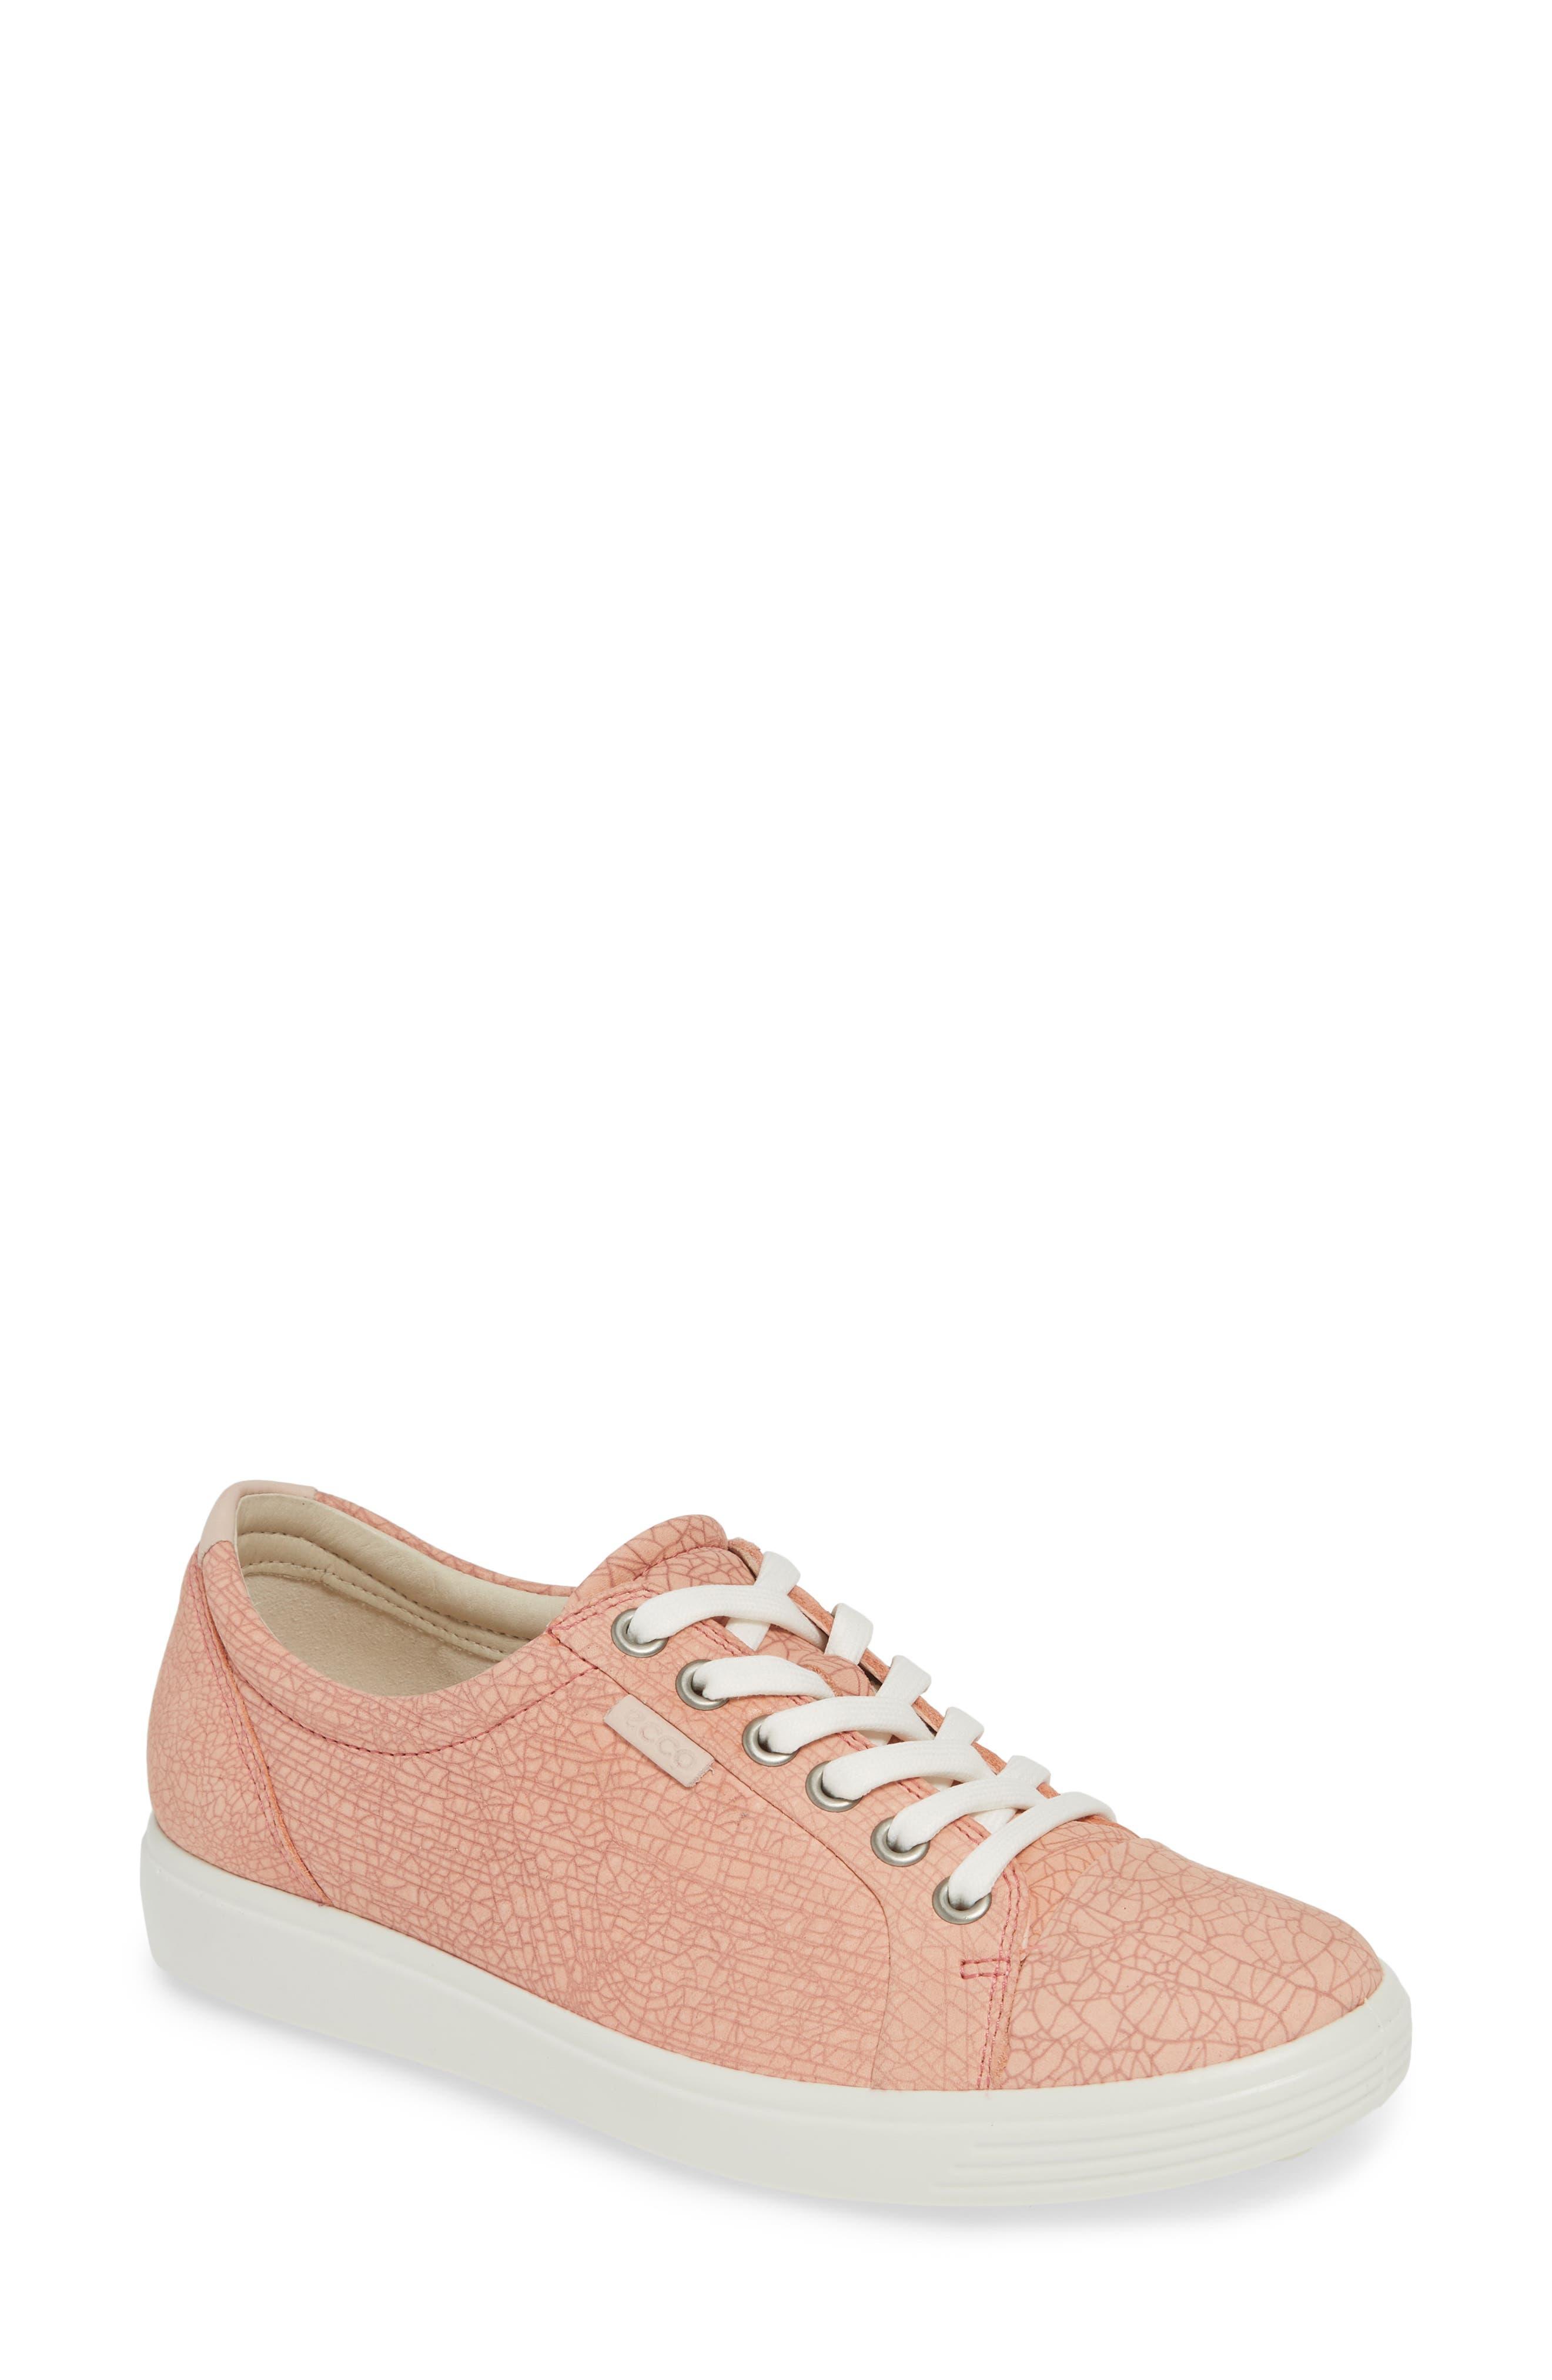 ,                             Soft 7 Sneaker,                             Main thumbnail 189, color,                             950